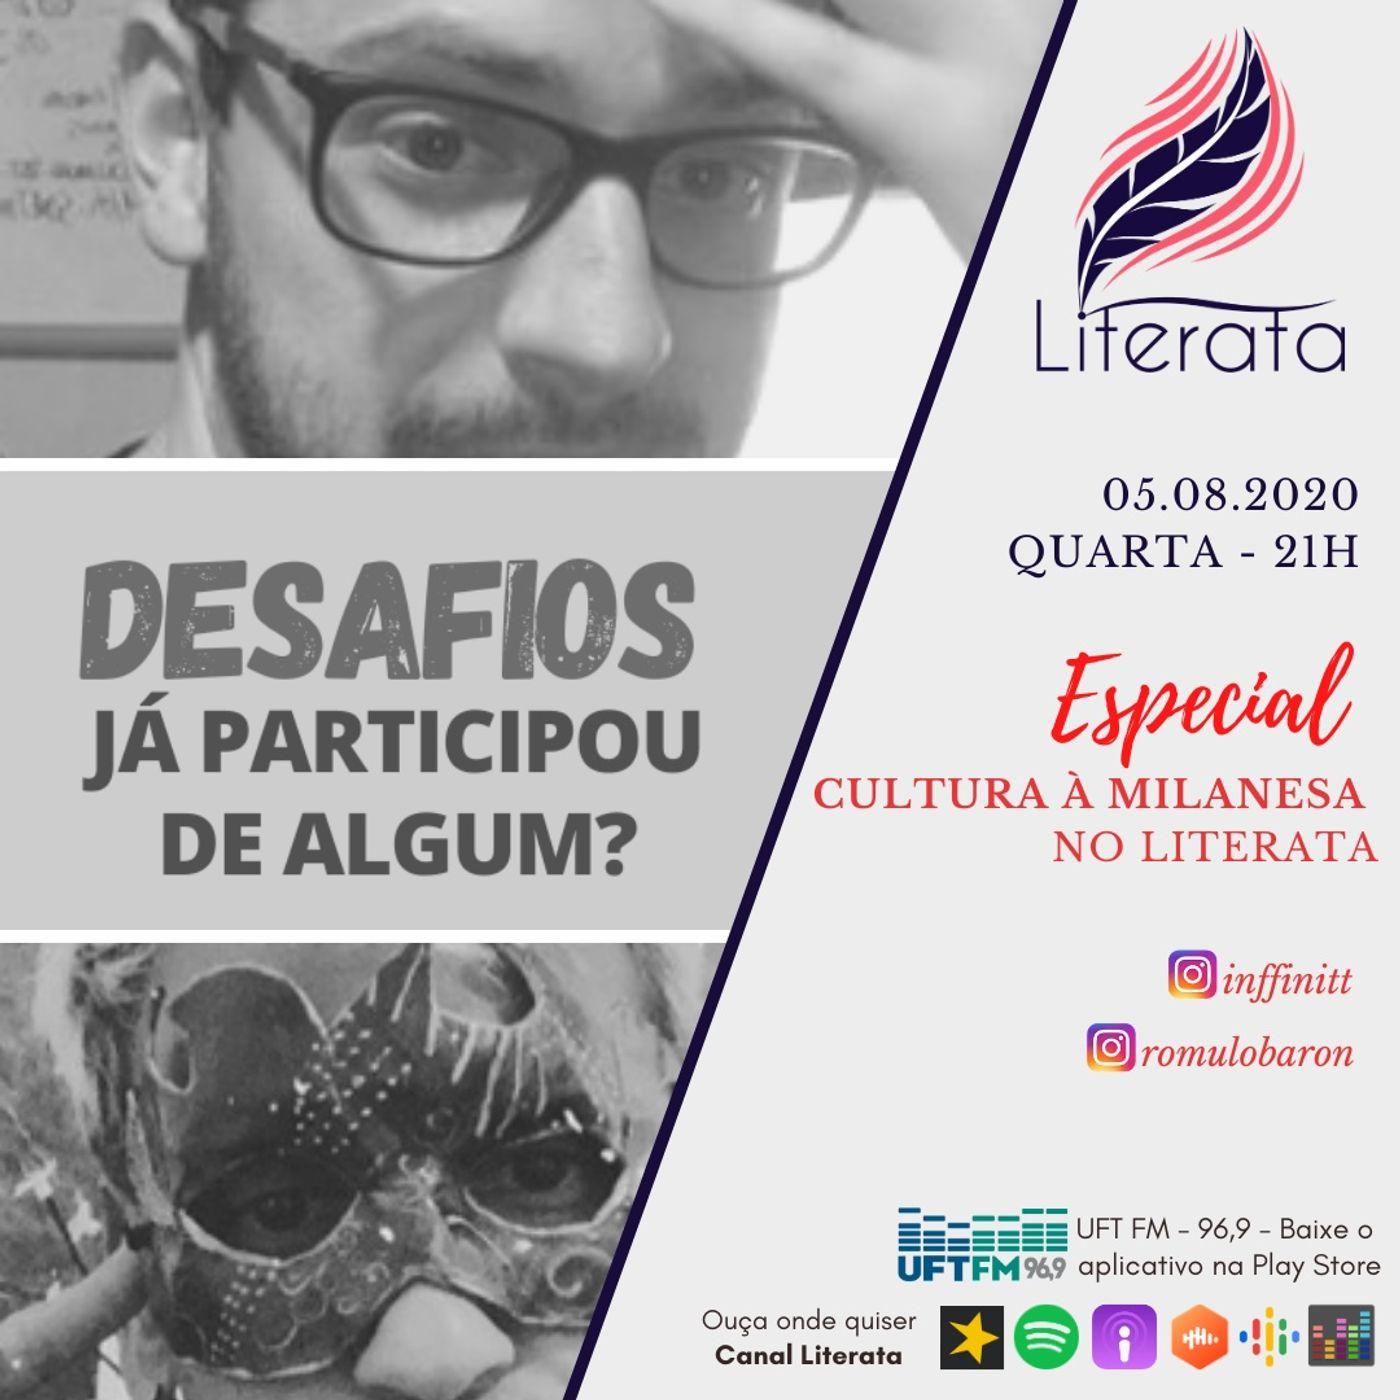 #064 - Especial CàM no Literata - Desafios